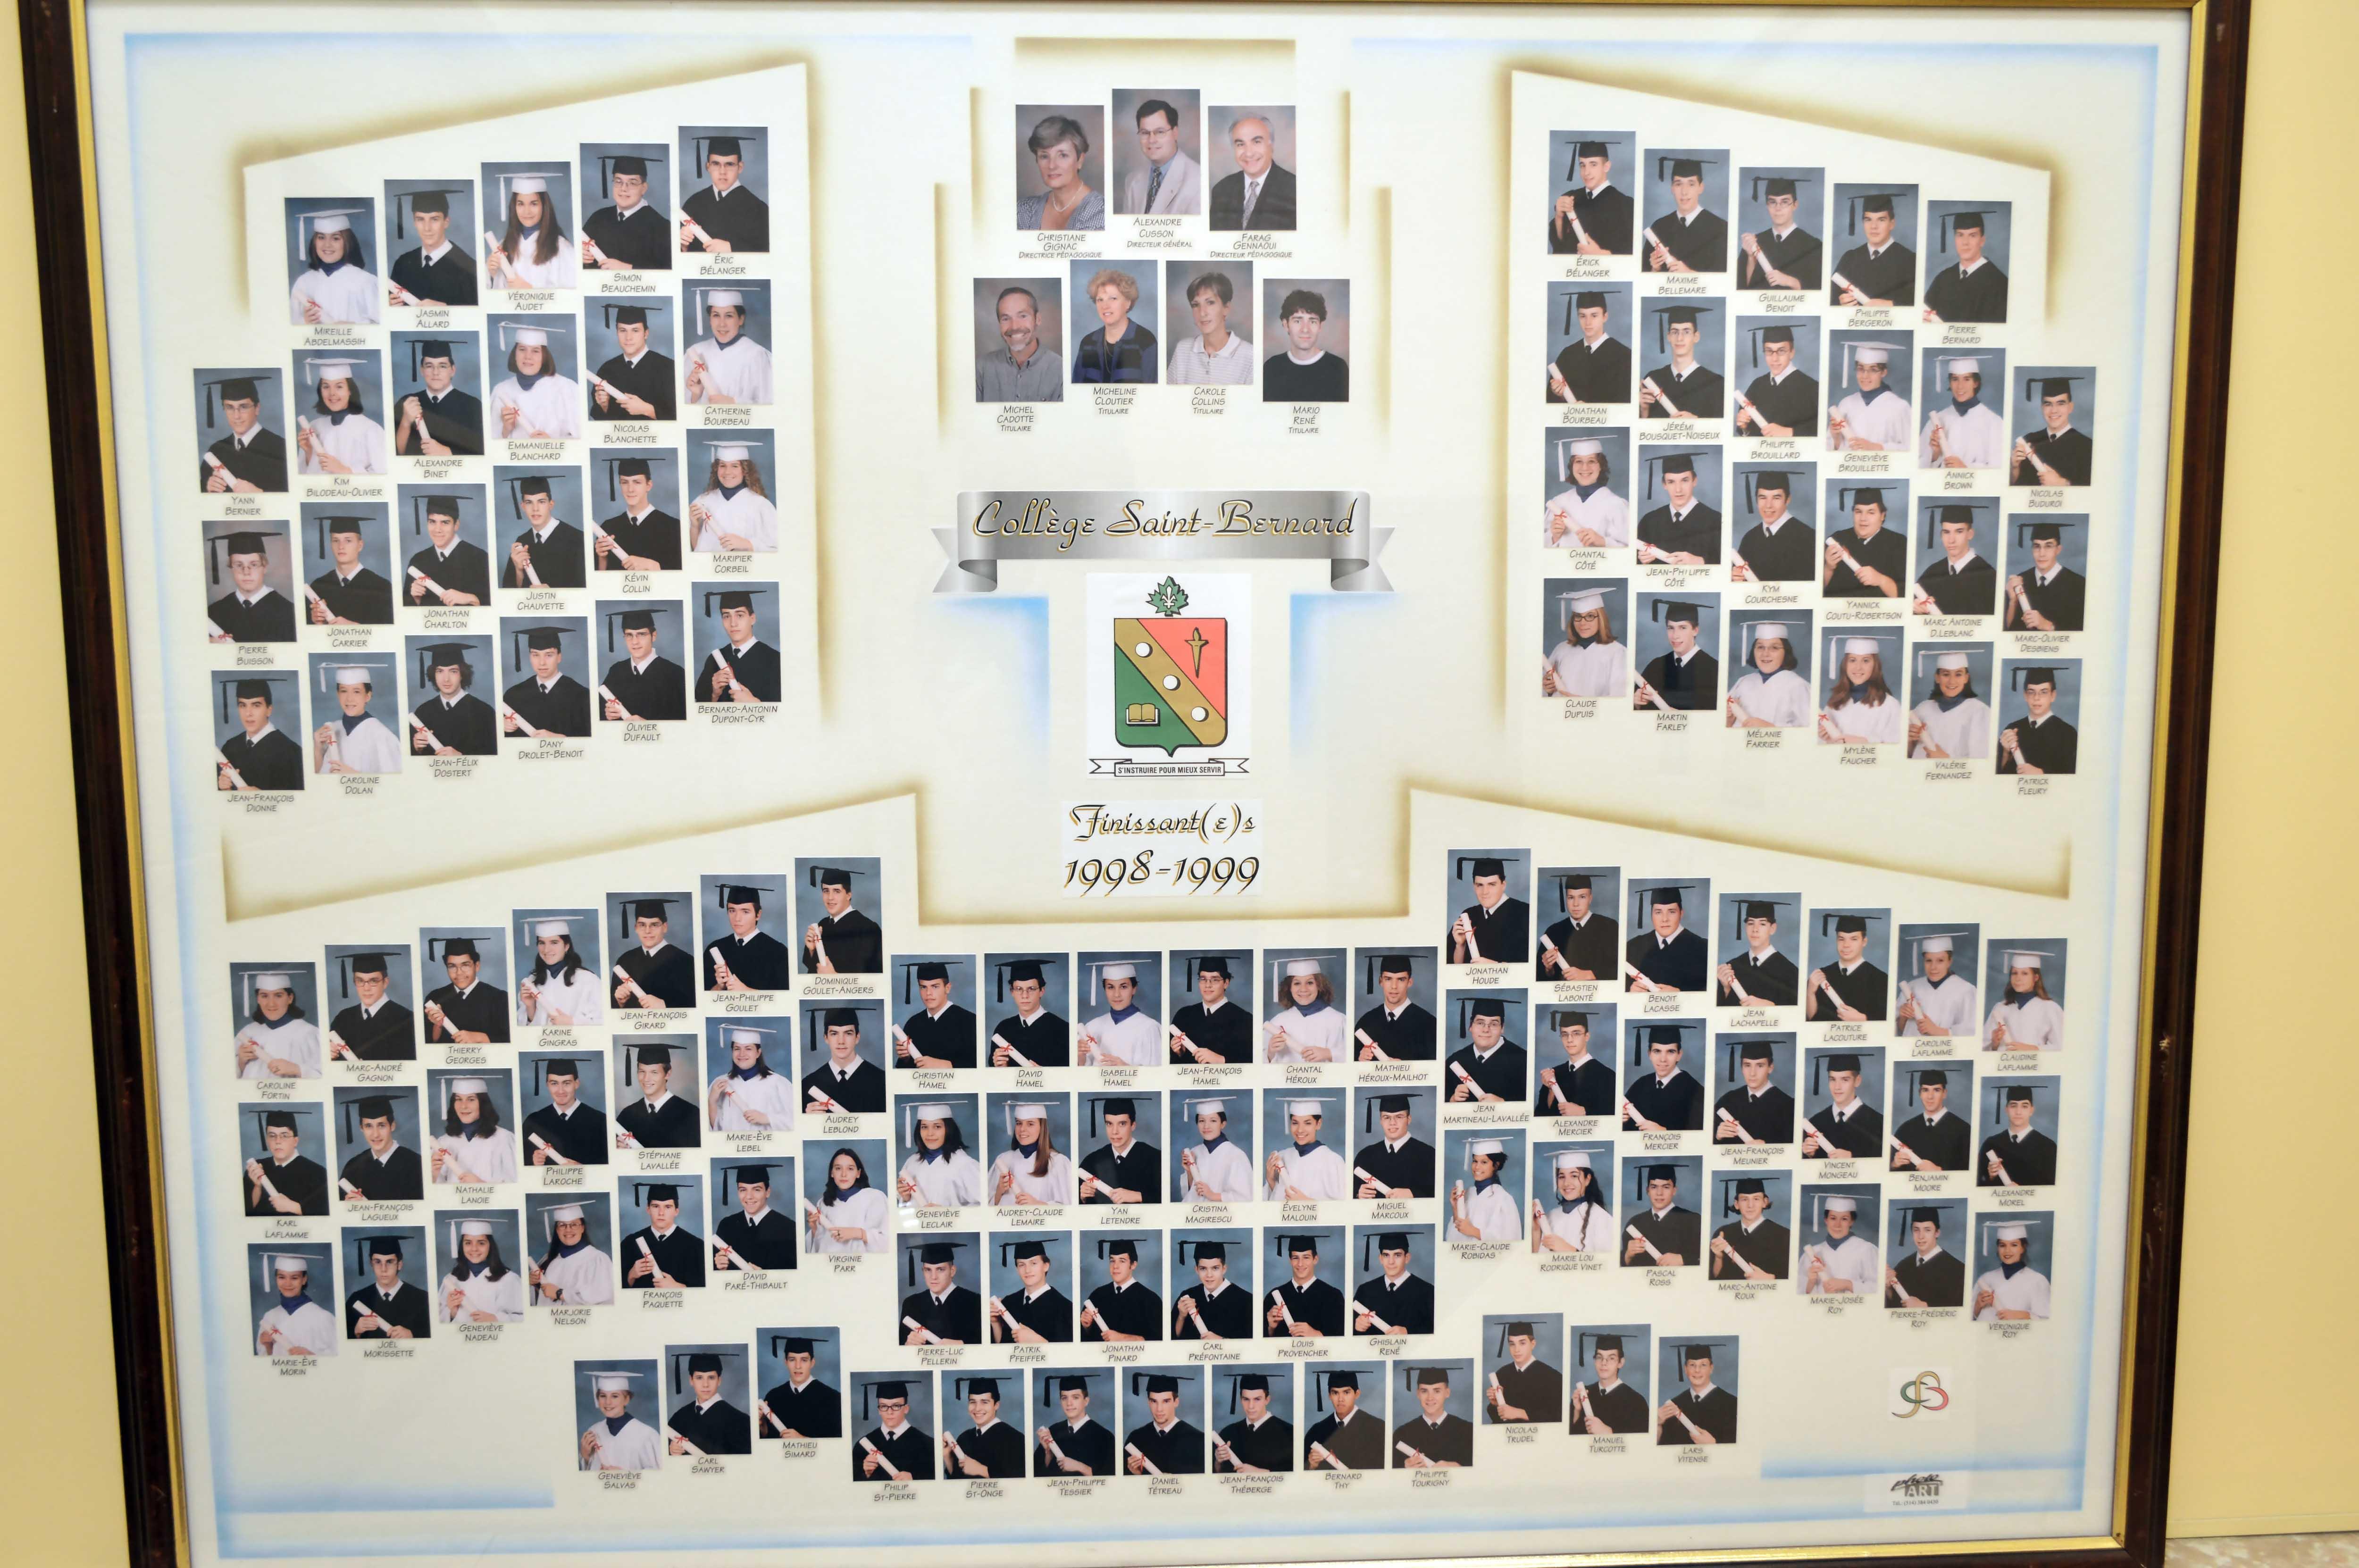 College-Saint-Bernard_Graduations-1998-99